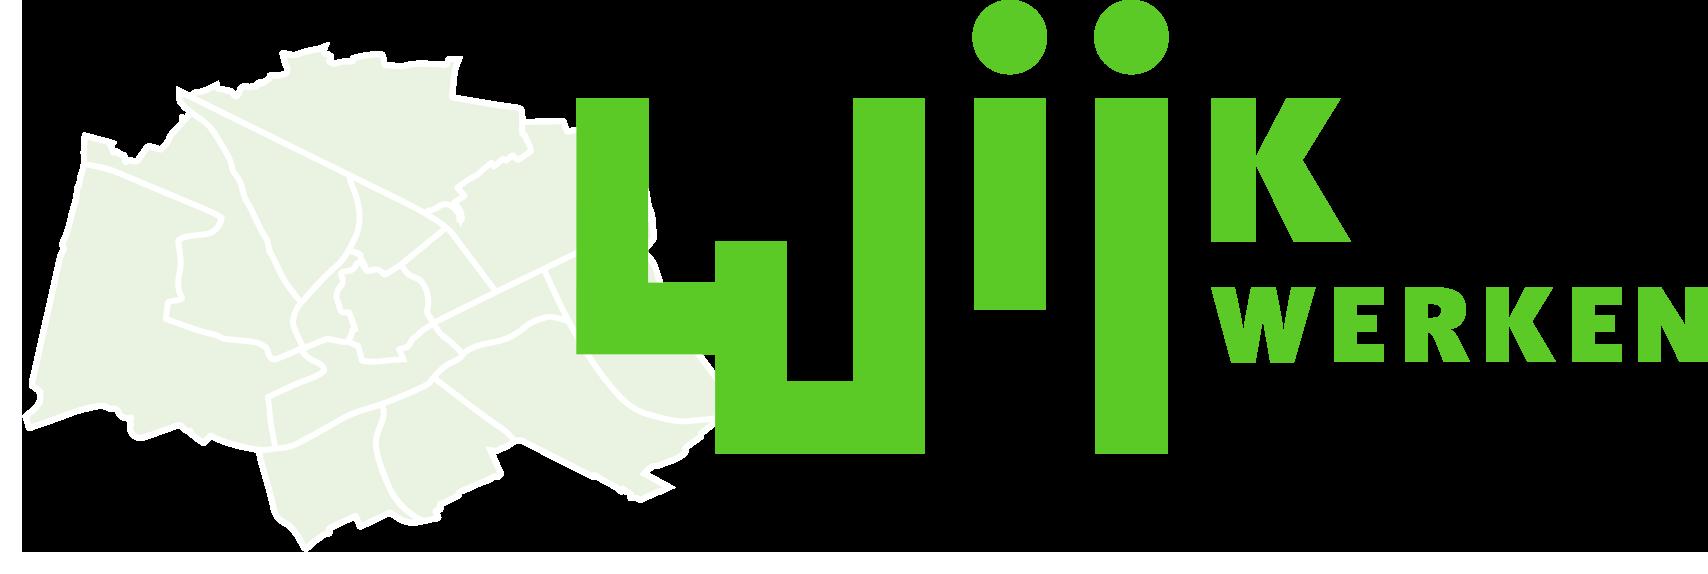 wijkwerken logo